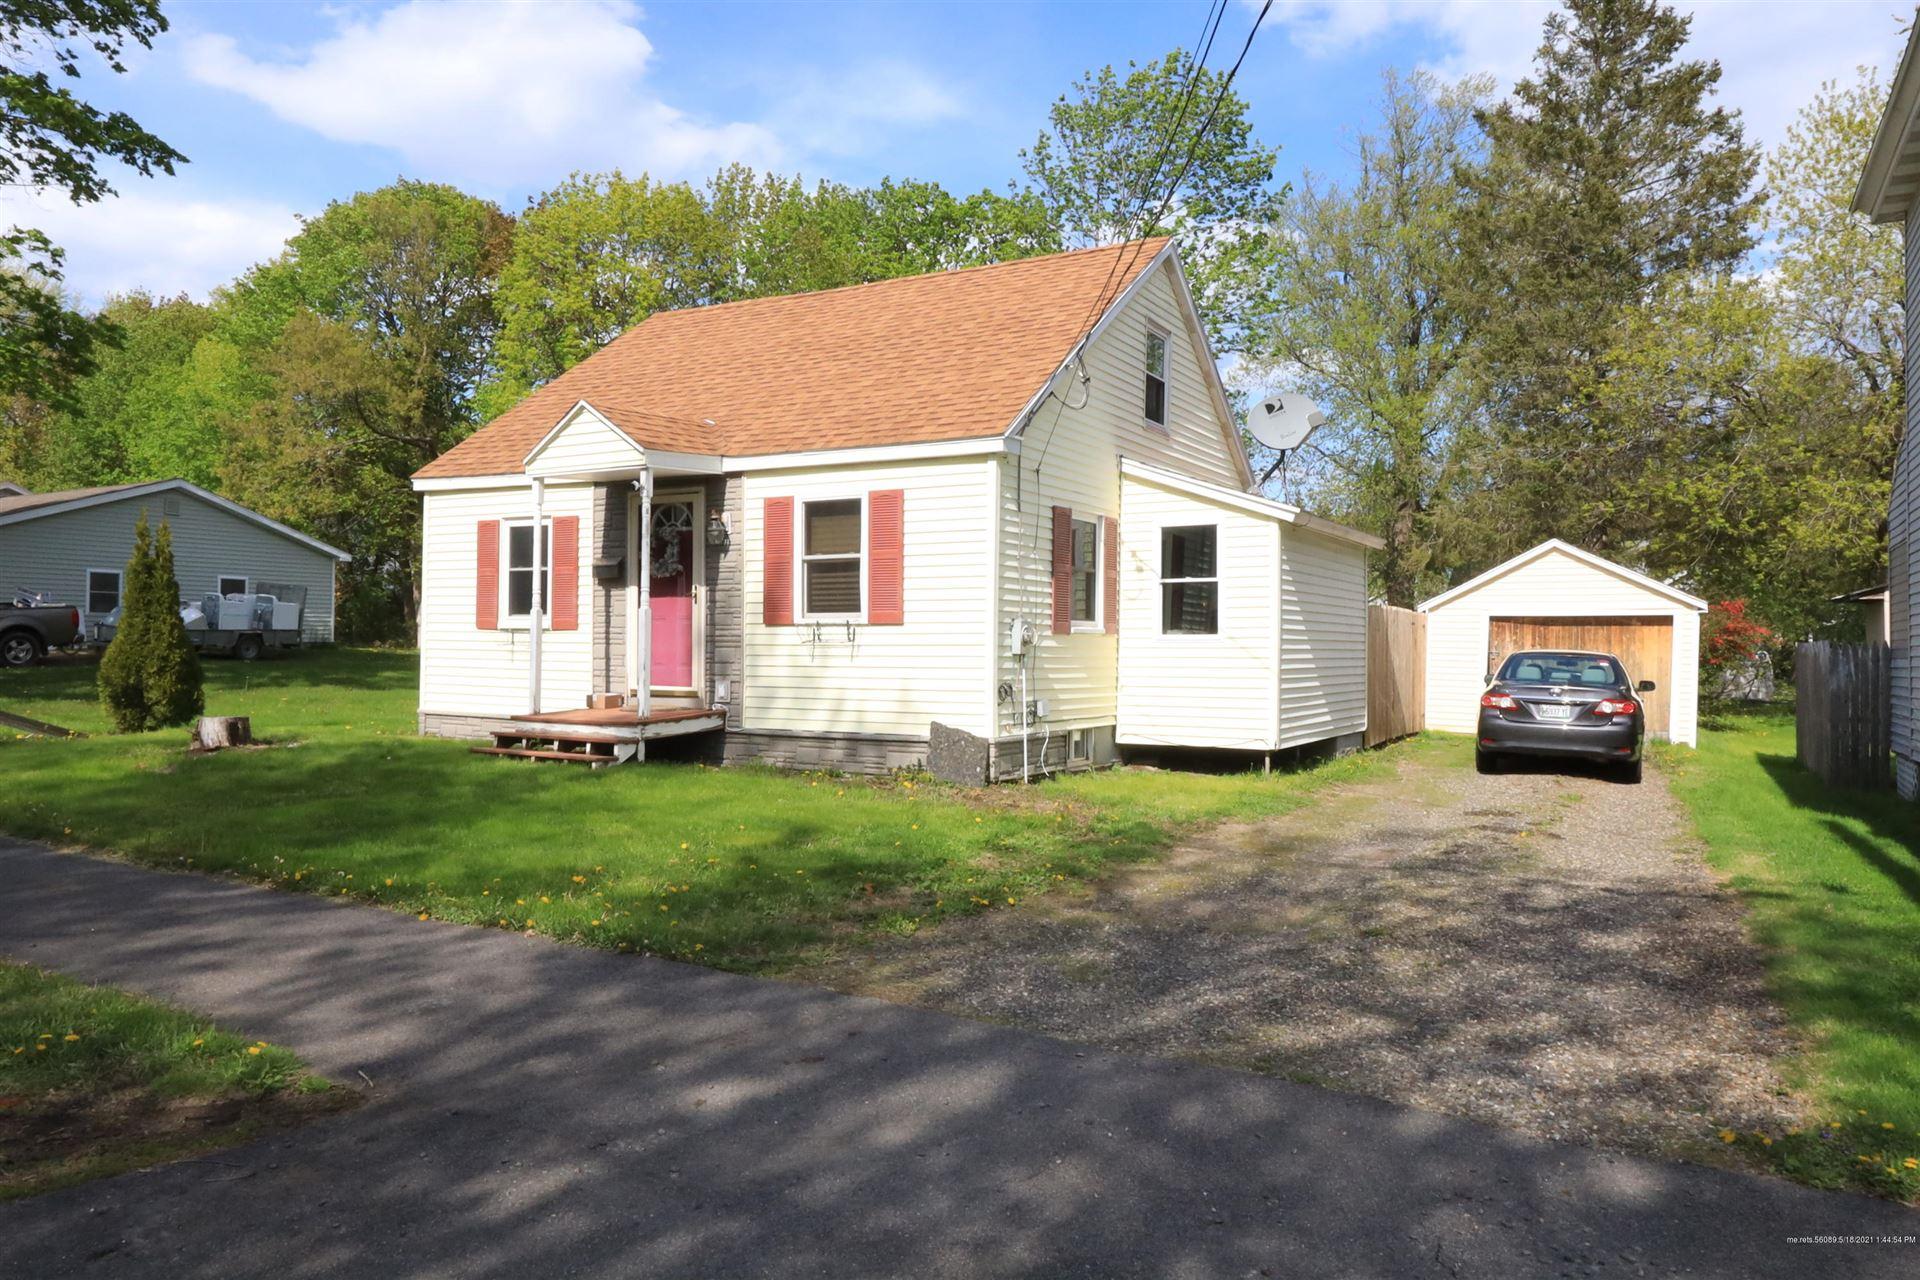 Photo of 247 Parkview Avenue, Bangor, ME 04401 (MLS # 1491778)